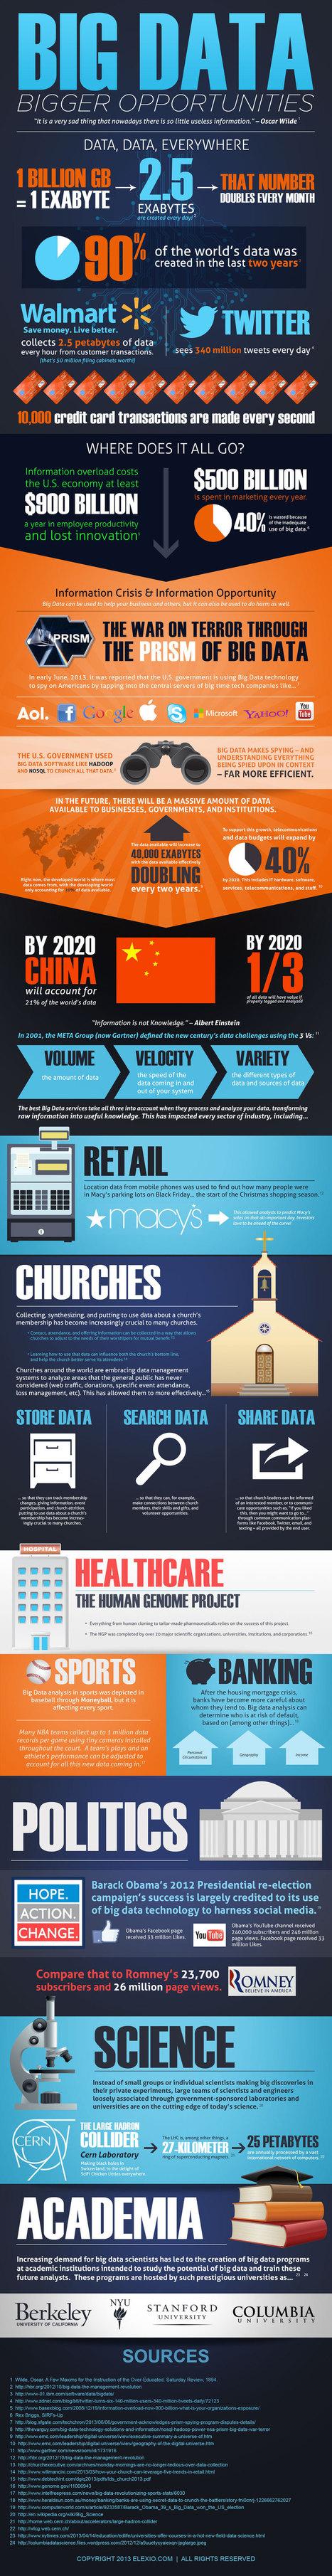 Big Data Infographic | digitalassetman | Scoop.it